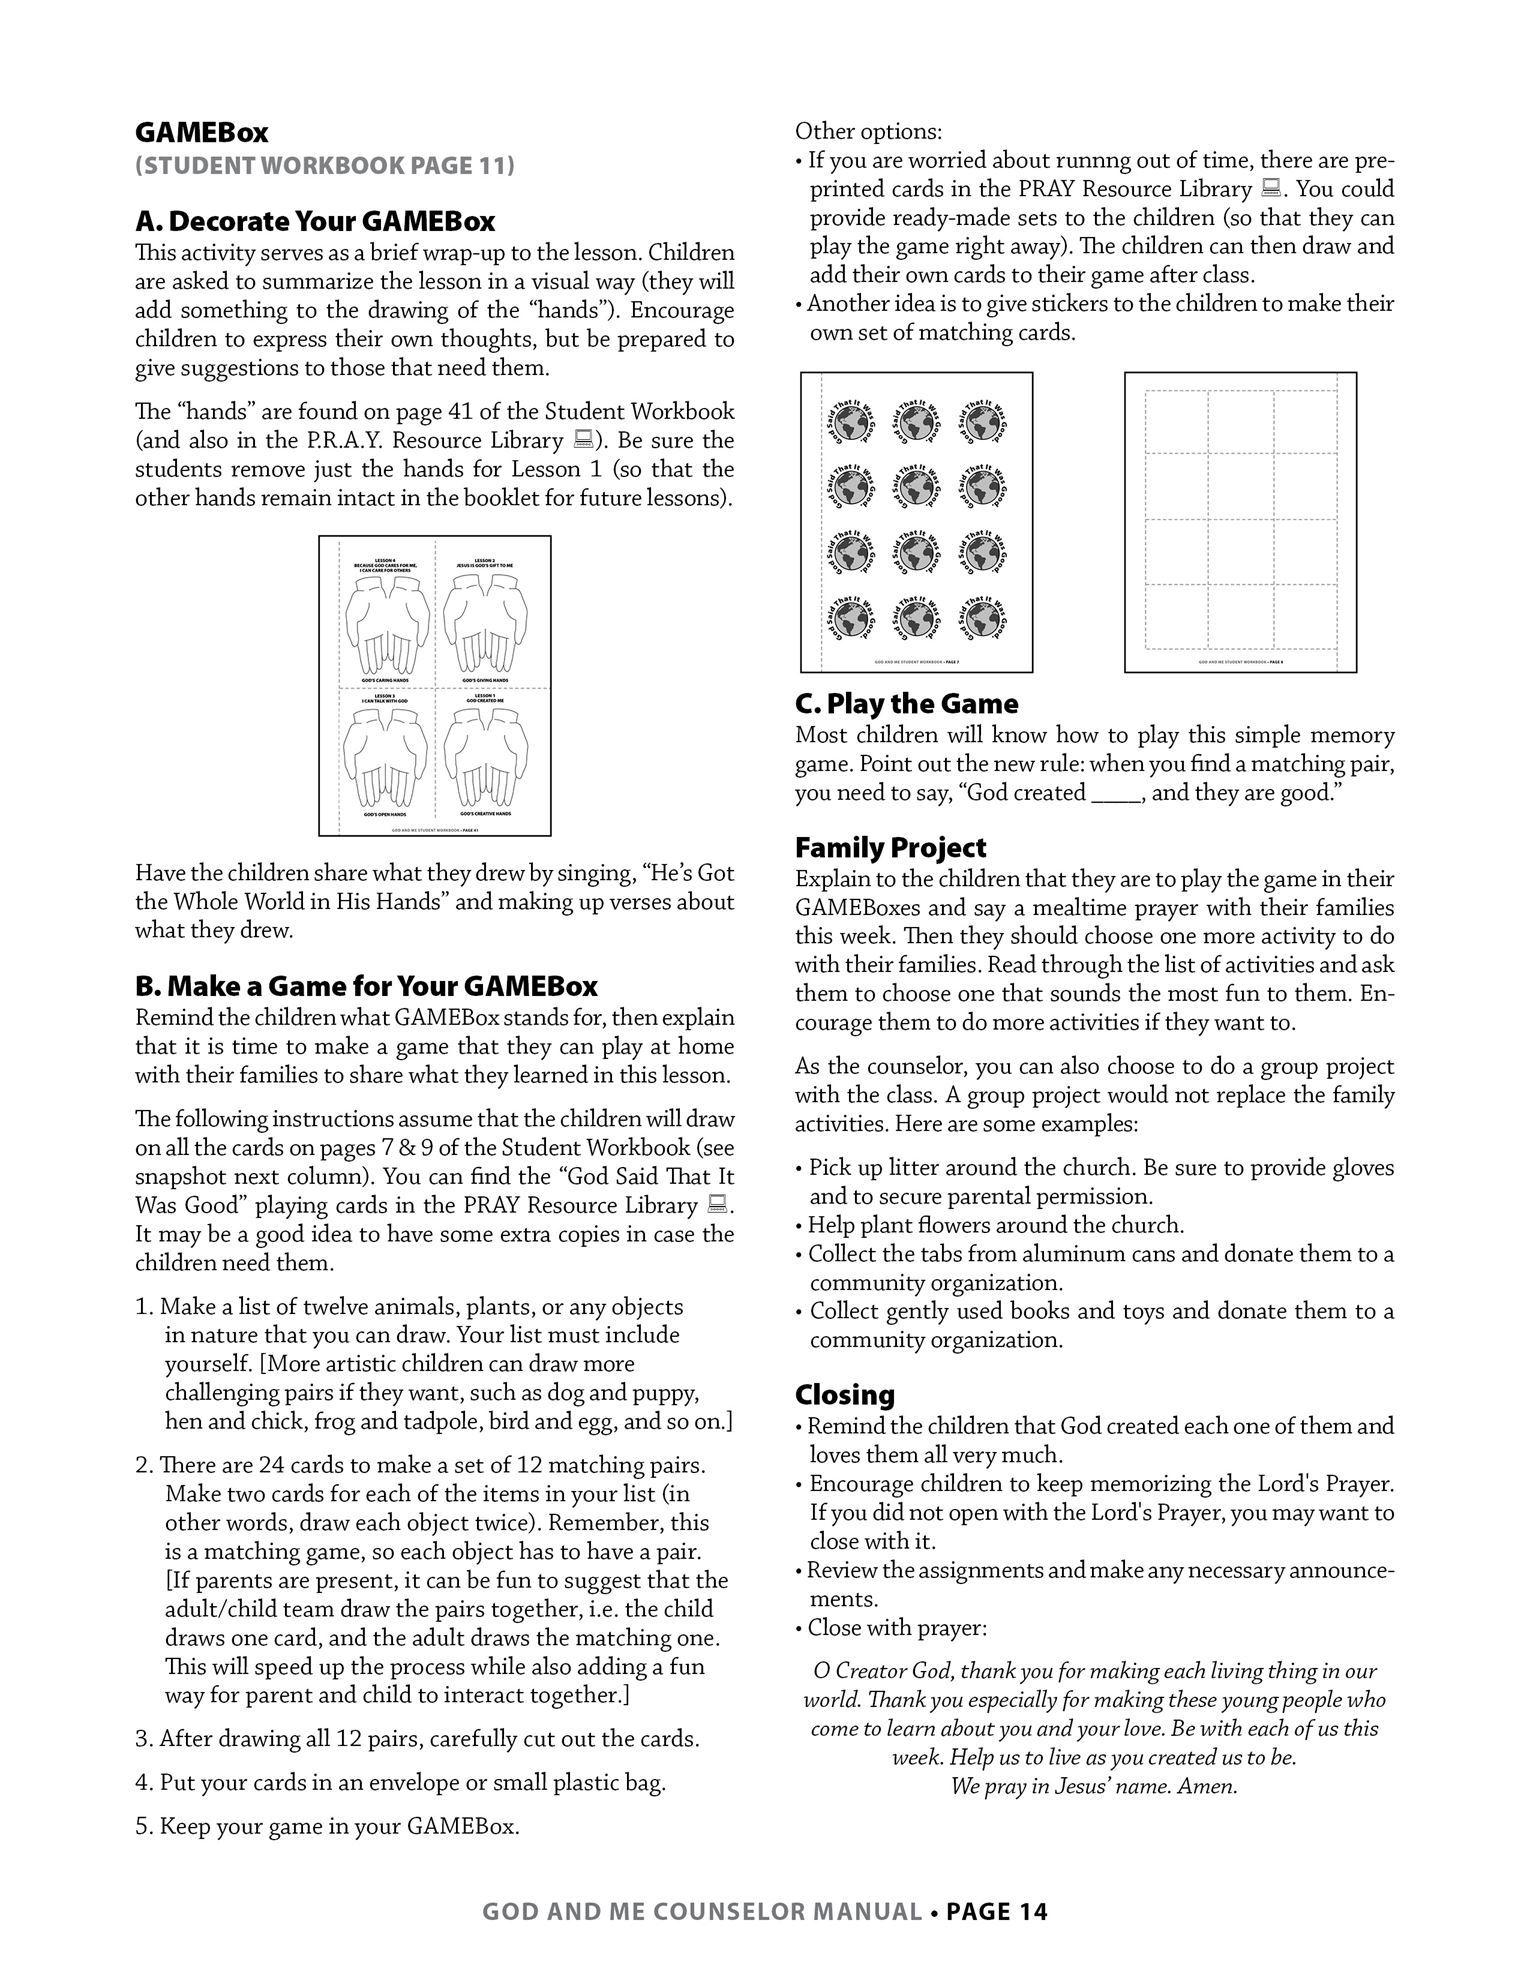 Lesson 1, page 14